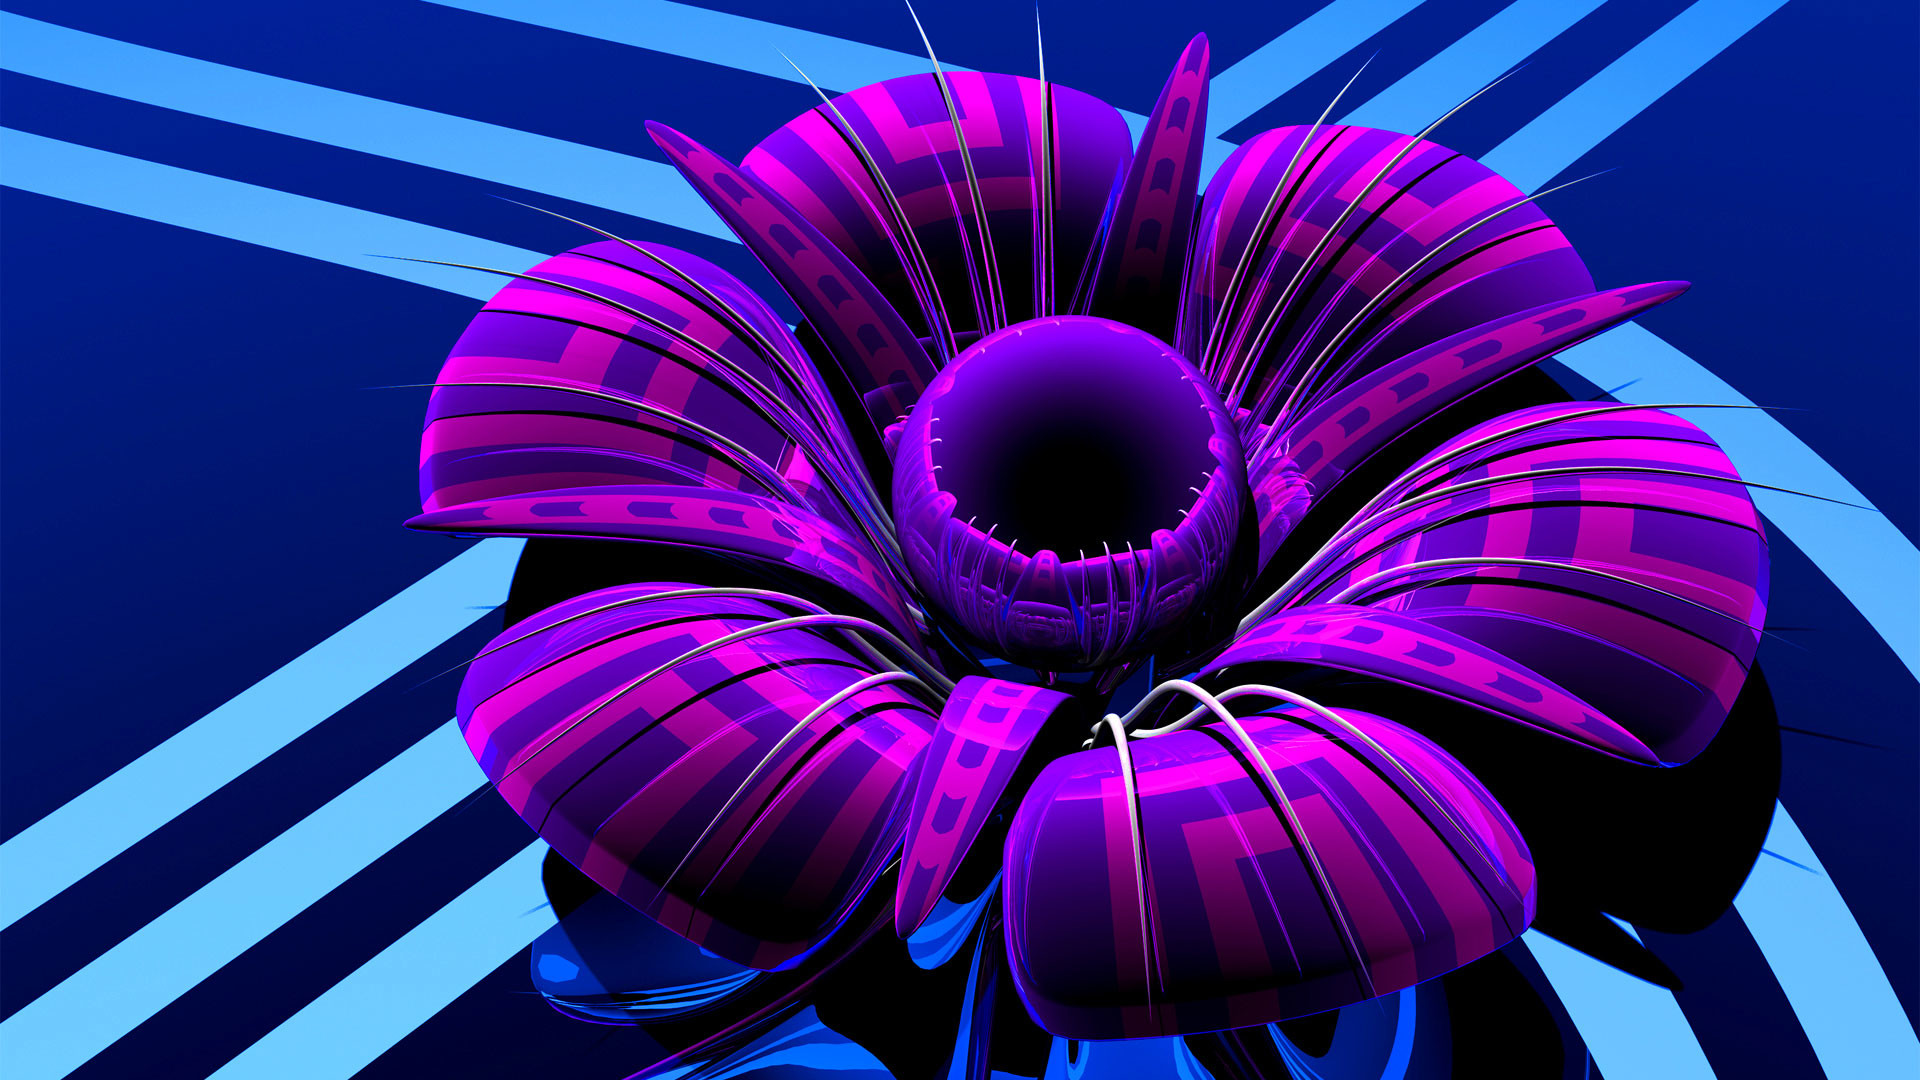 hd pics photos best stunning 3d animated flower glossy neon purple hd  quality desktop background wallpaper